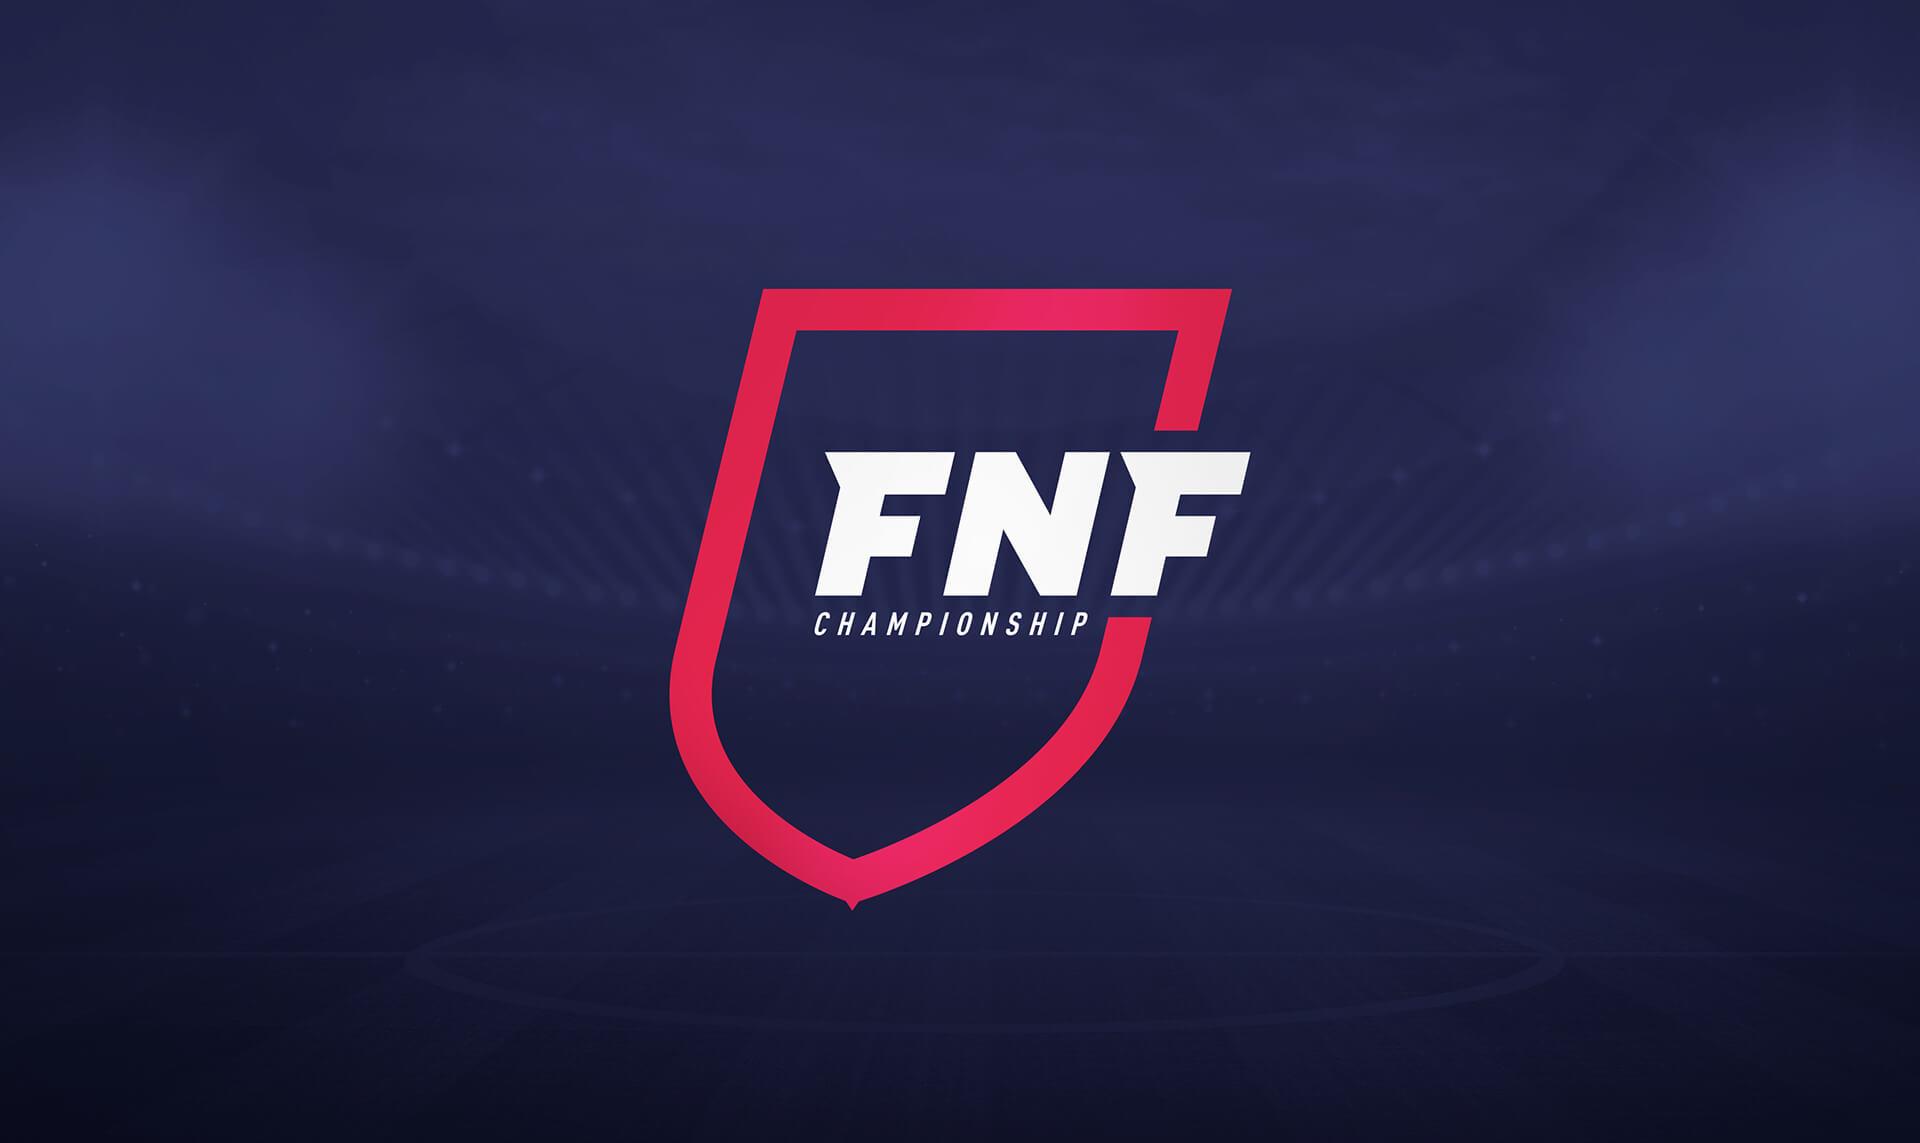 FNF Championship